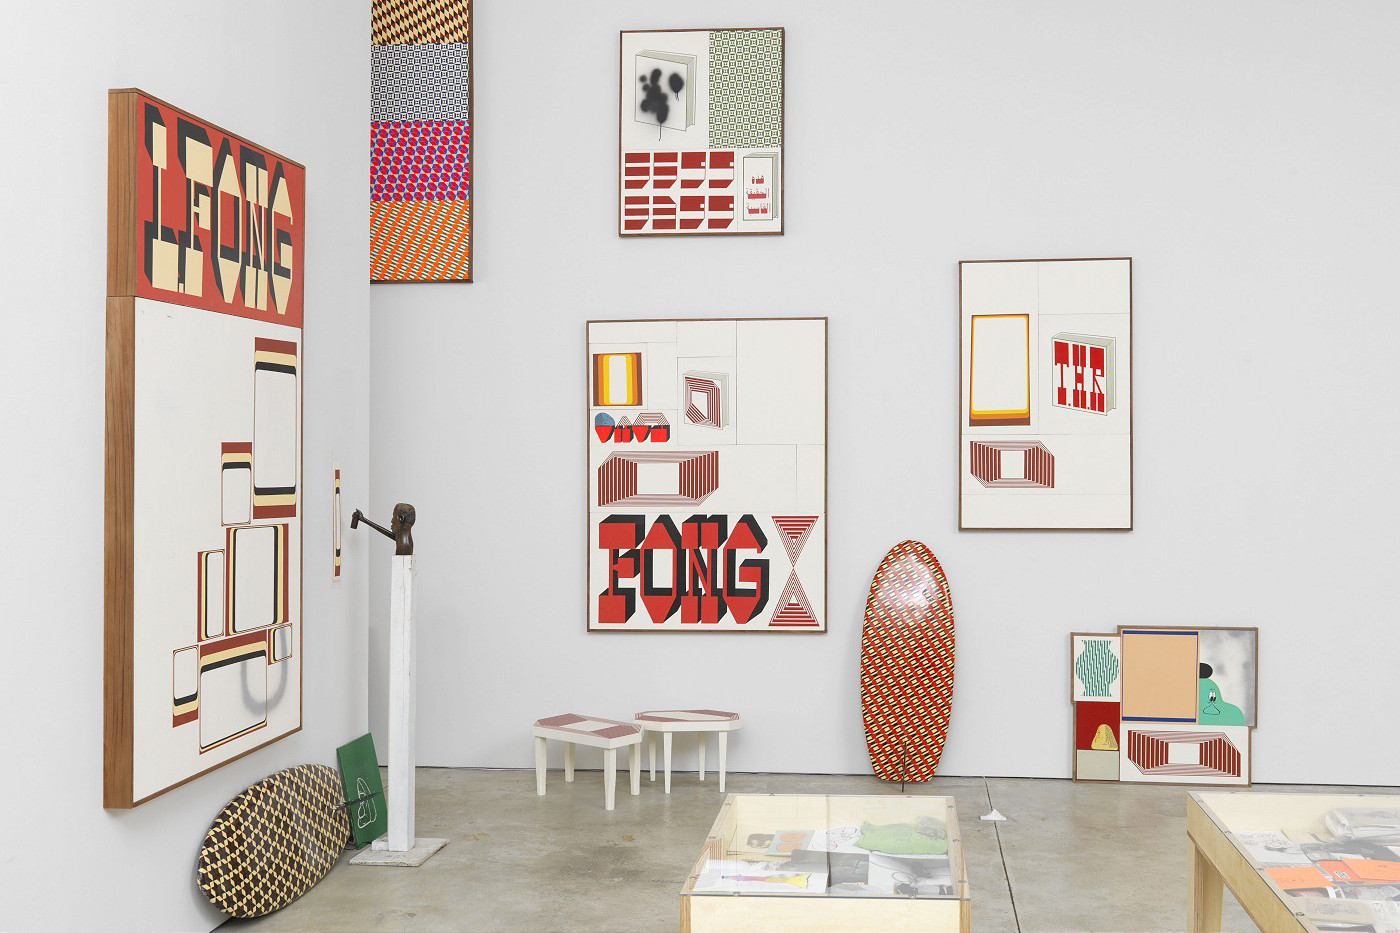 Best New Art James Jean Larry Clark Nate Lowman Barry Mcgee Tadashi Kawamata Exhibit Installation Paintings